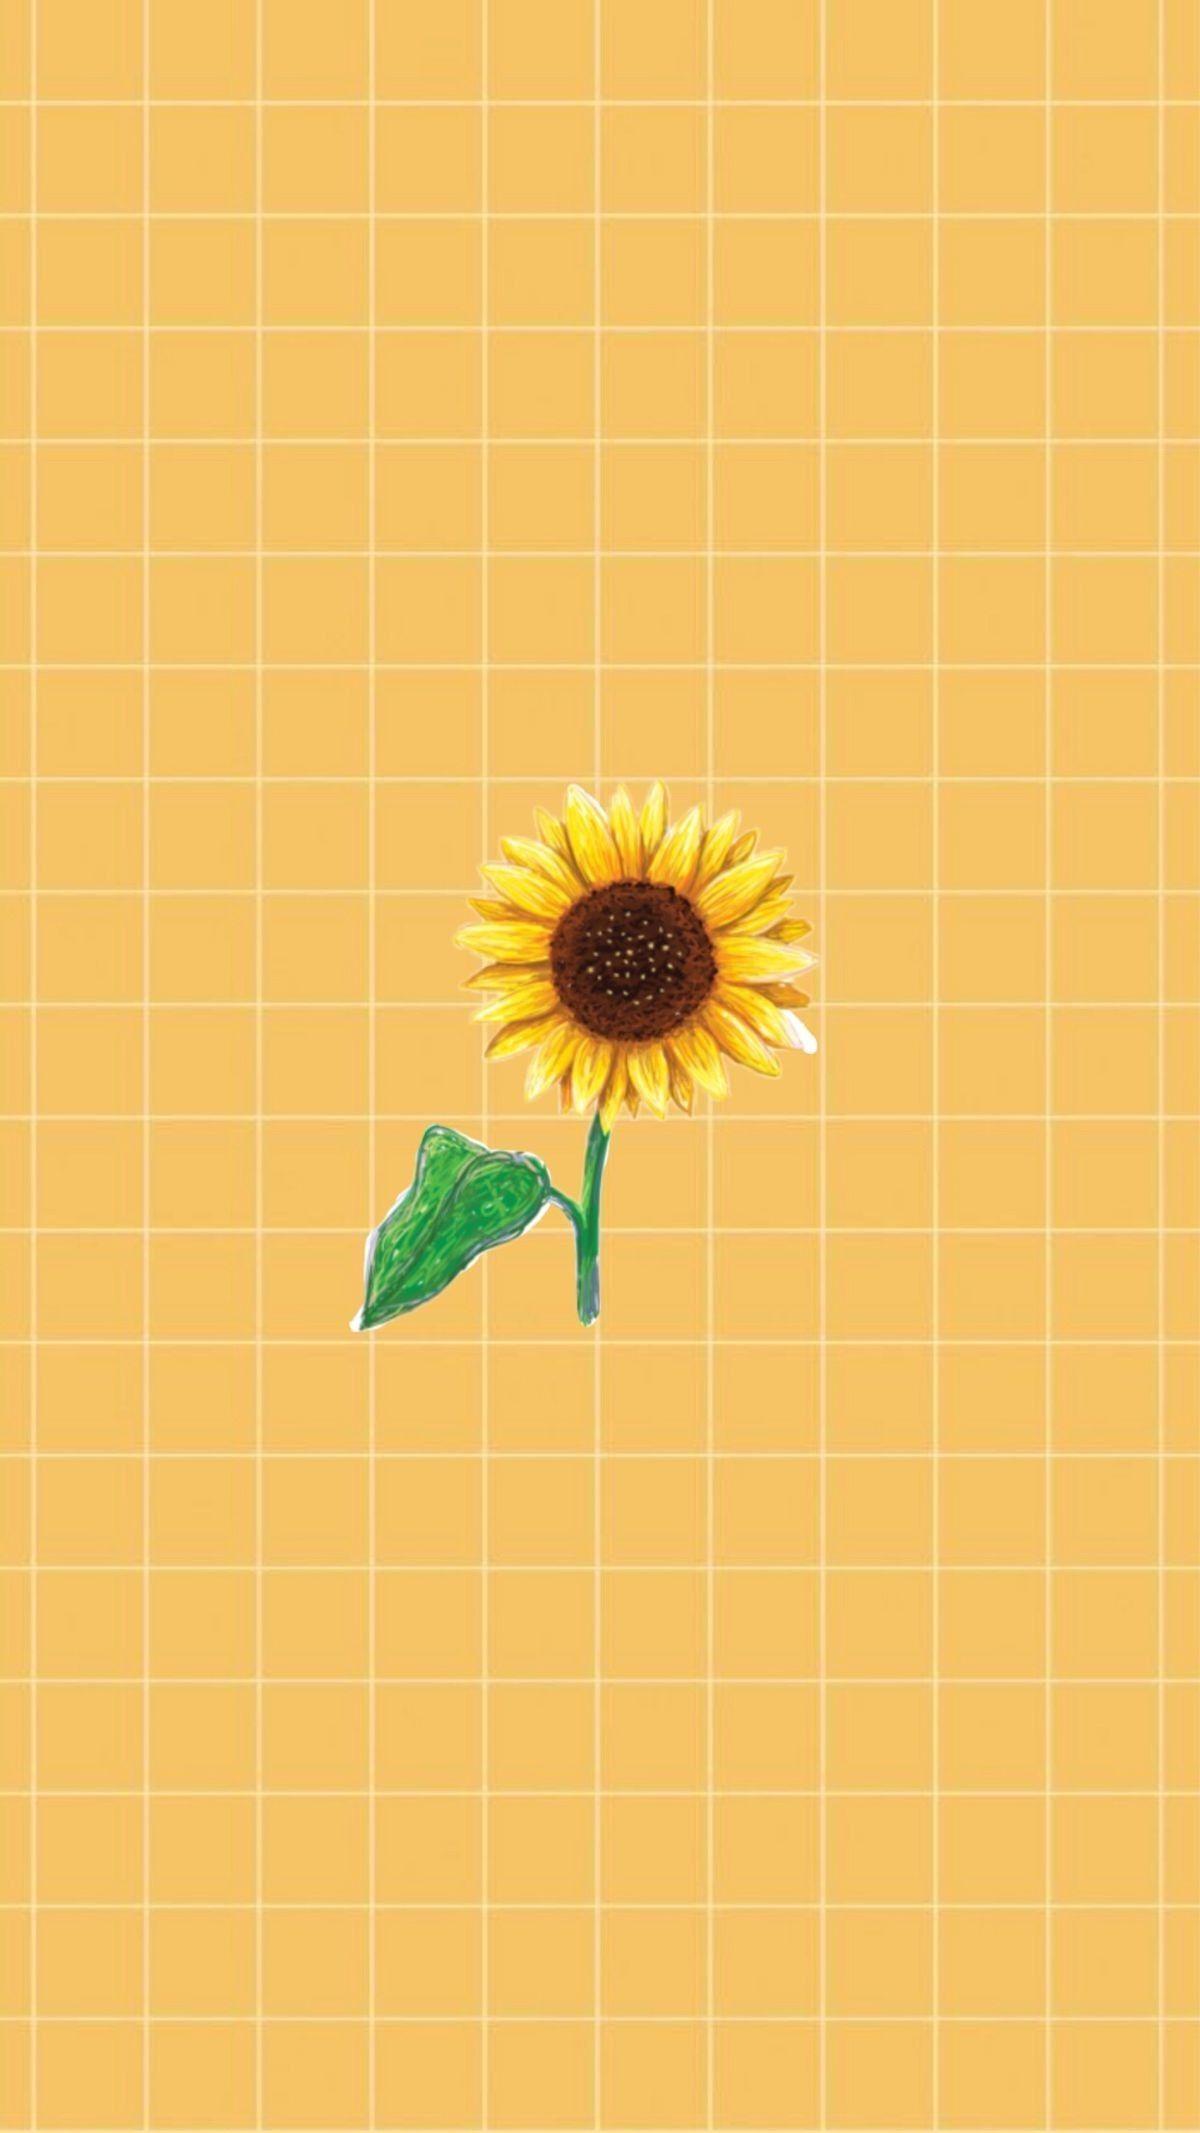 pin by vivian rose on •aesthetics• in 2019 sunflower wallpaper